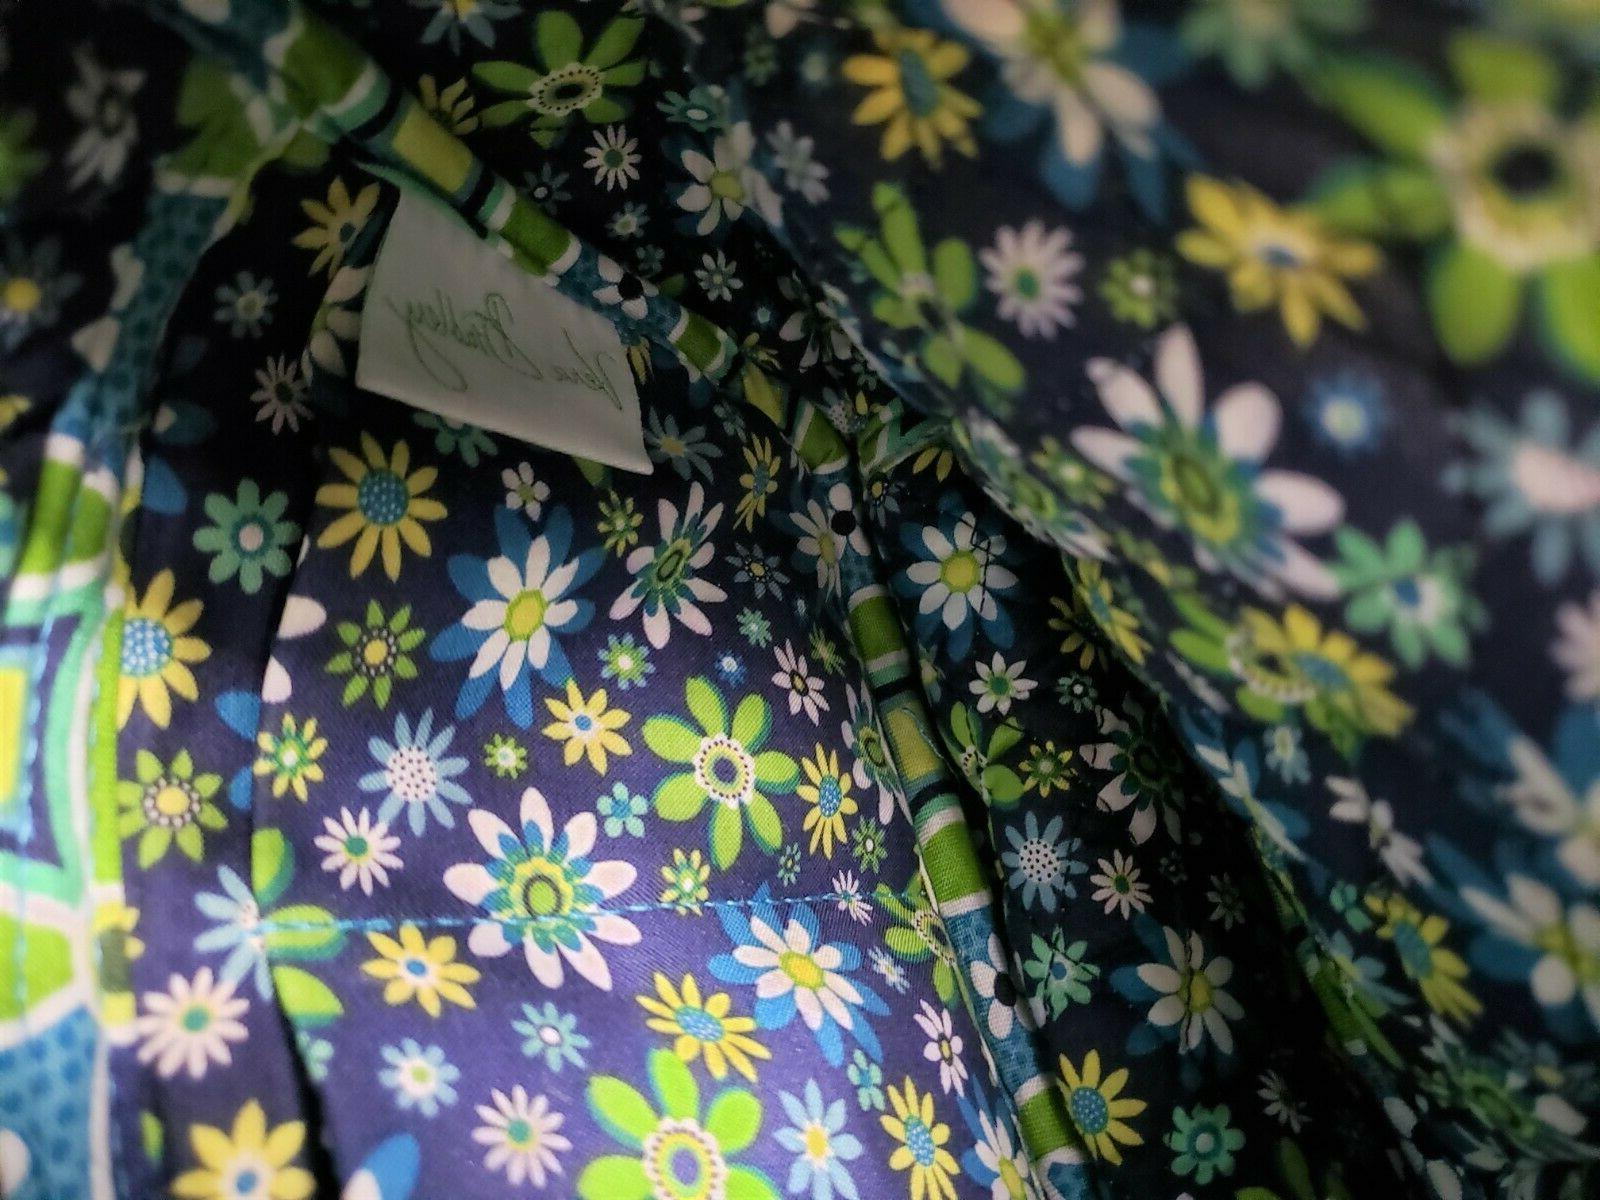 Green Crossbody Bag - New